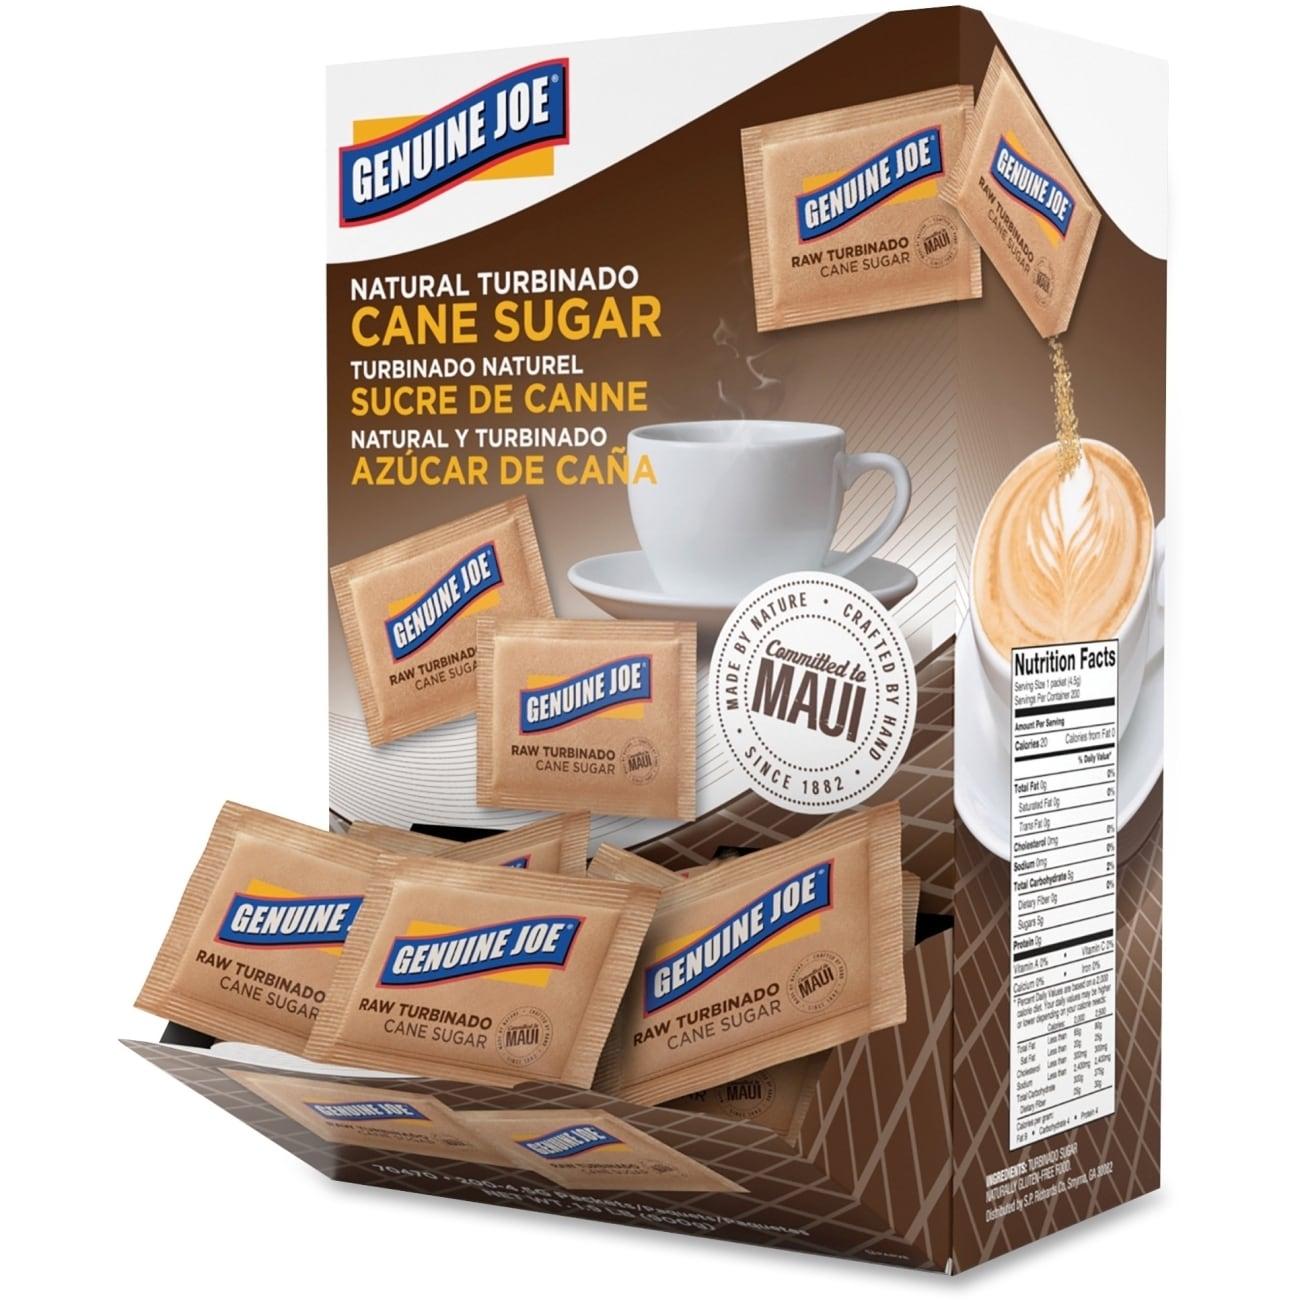 Details about Genuine Joe Turbinado Cane Sugar Packets (Pack of 200)